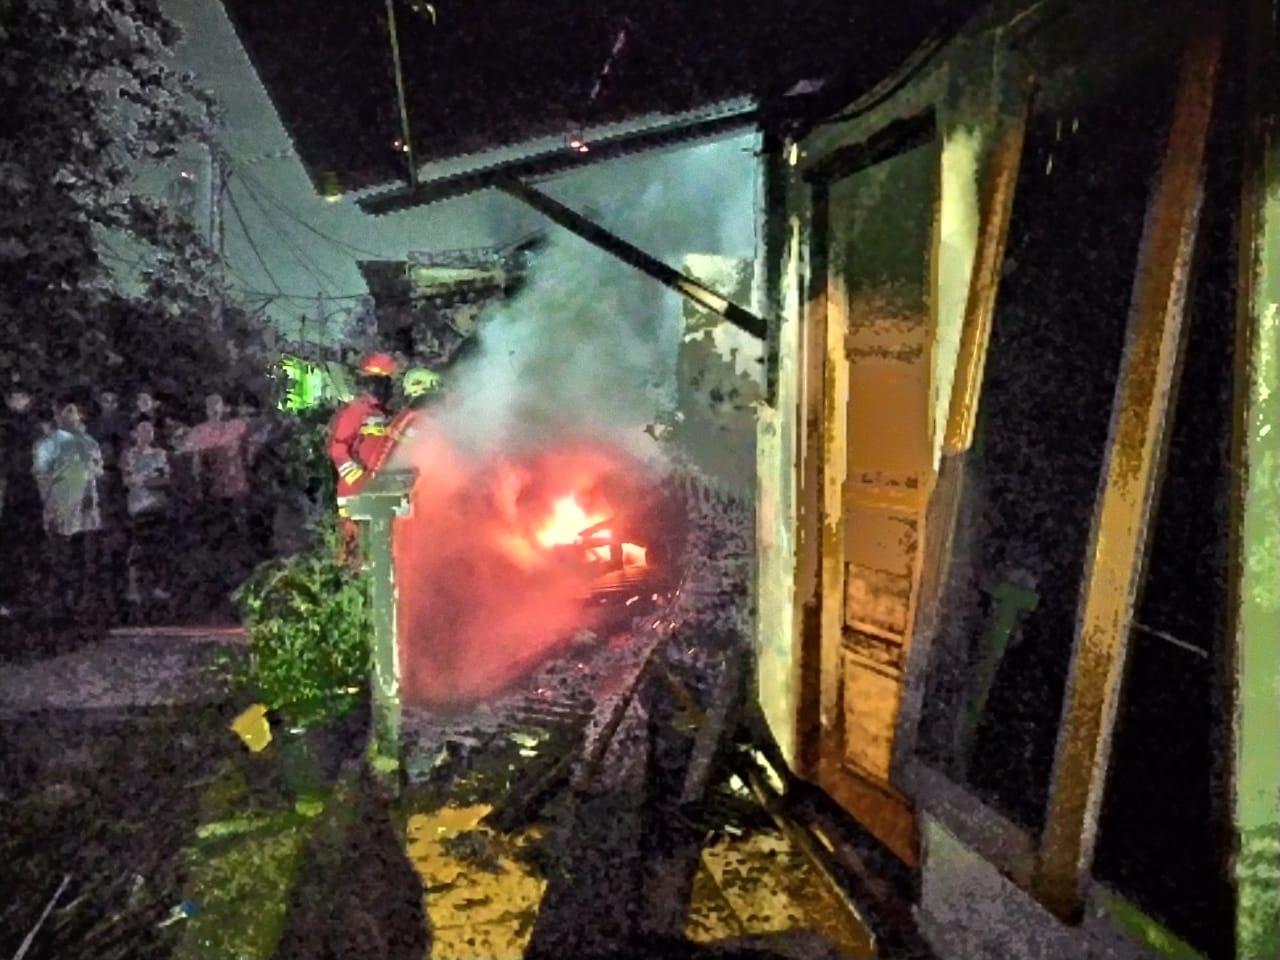 Tampak Petugas sedang memadamkan api yang berkobar, Tangerang Selatan, Senin (23/3/2020).